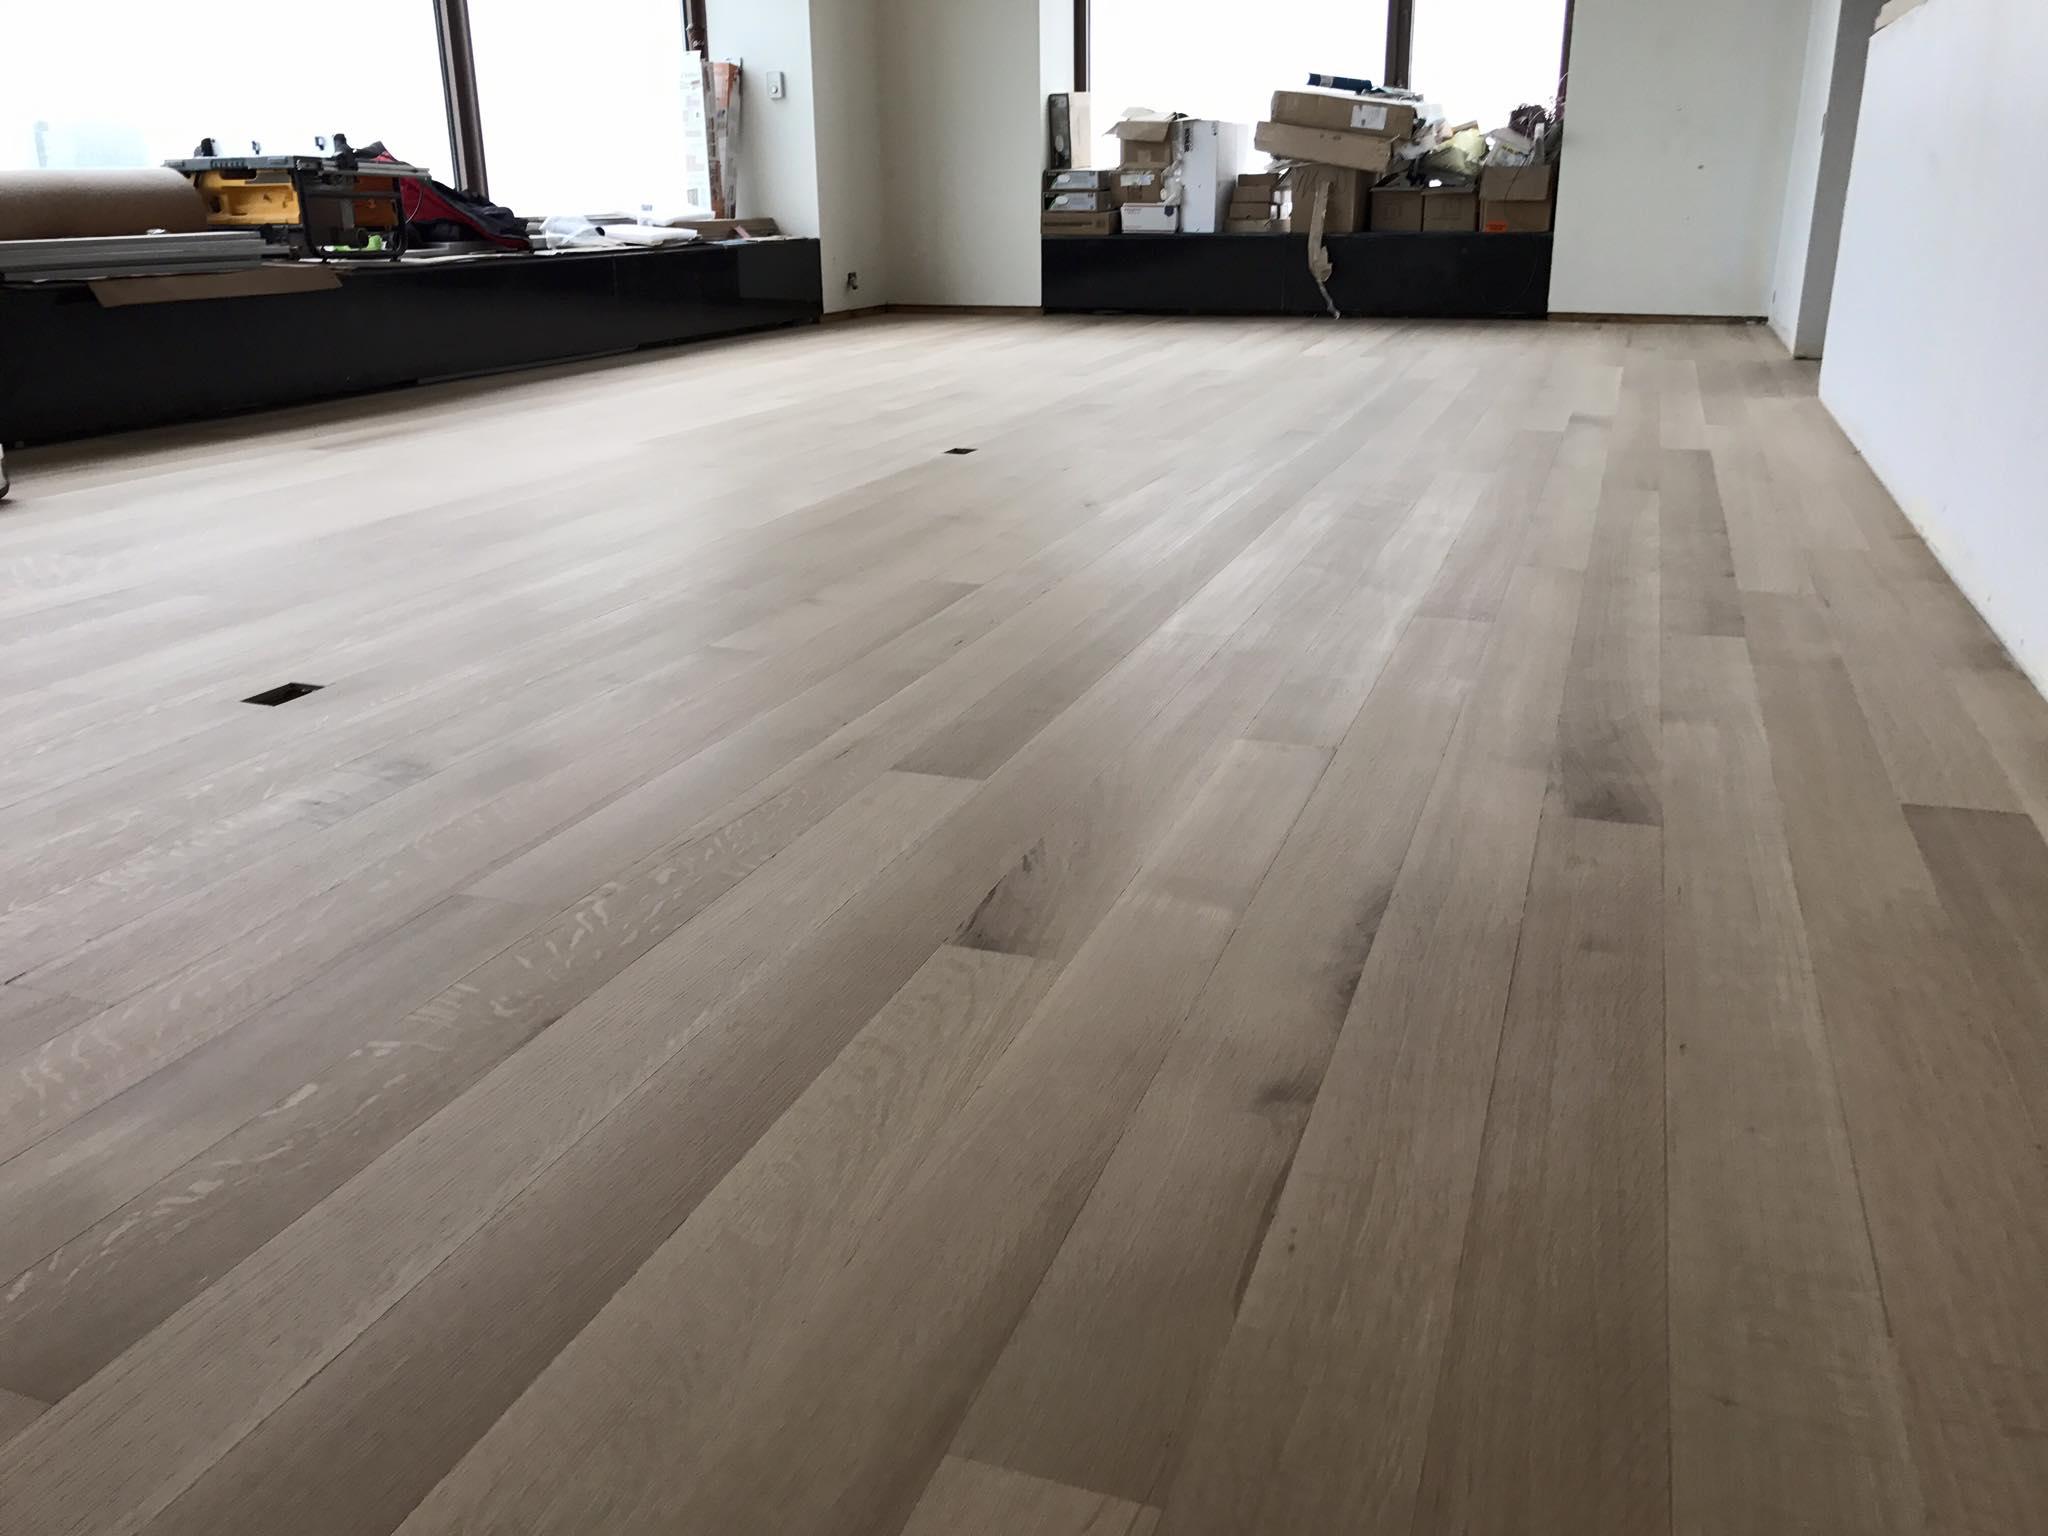 Whitewashed Hardwood Floor White Oak In Chicago Tom